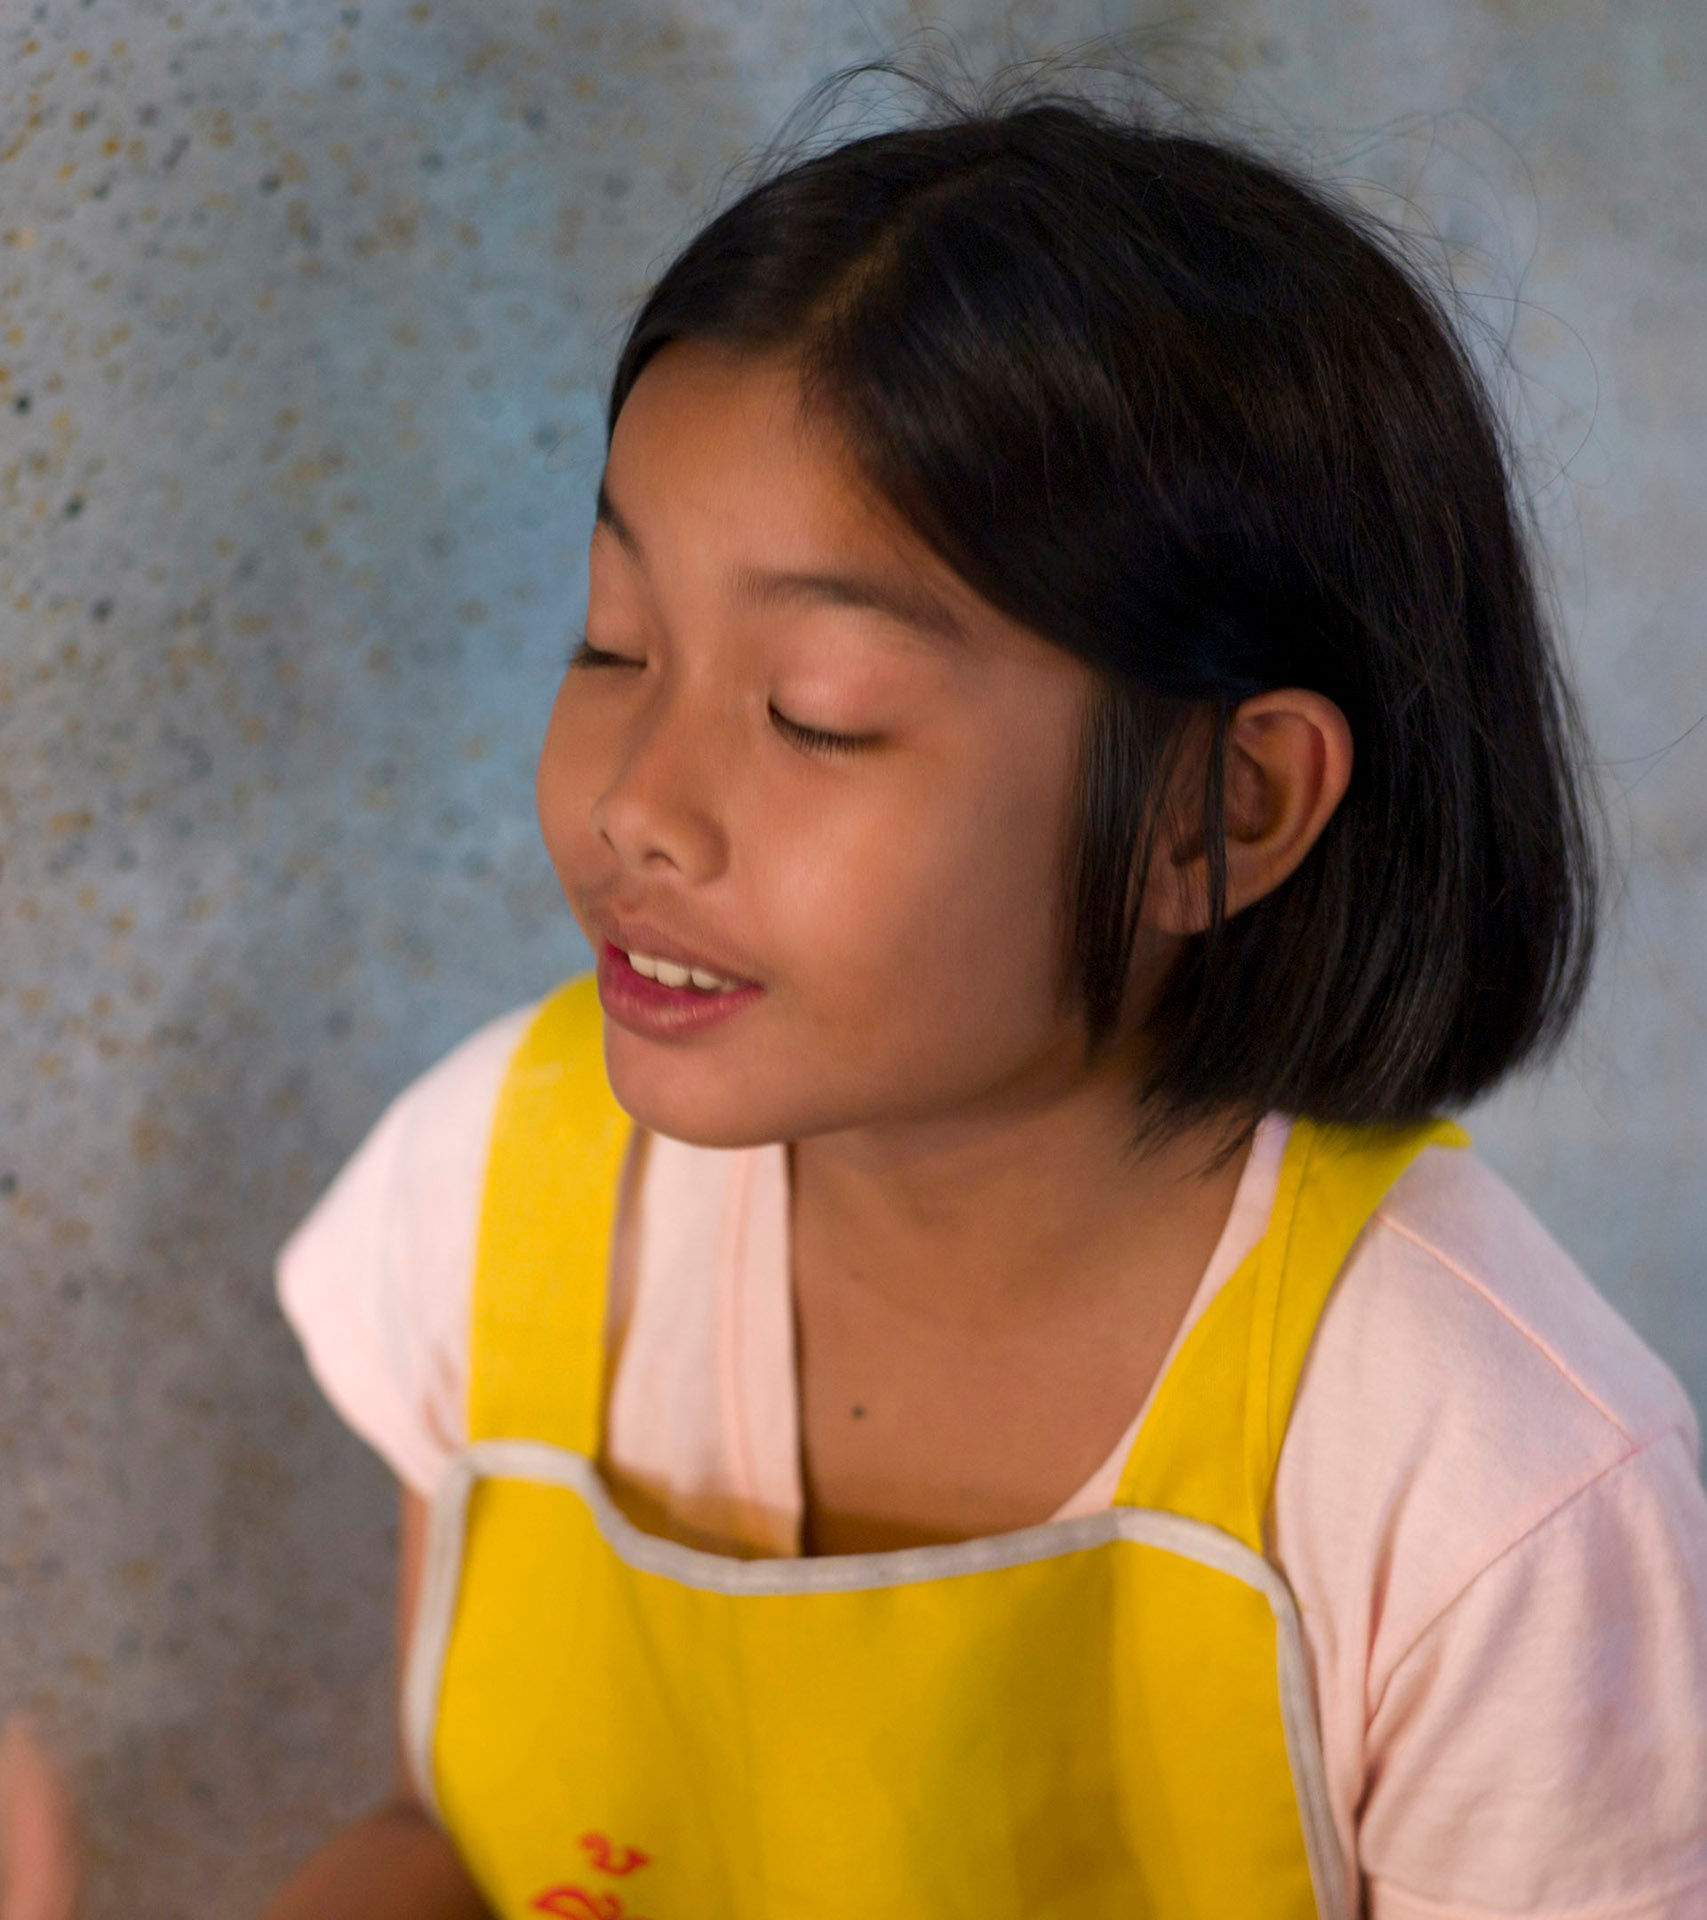 Girl Yellow Apron